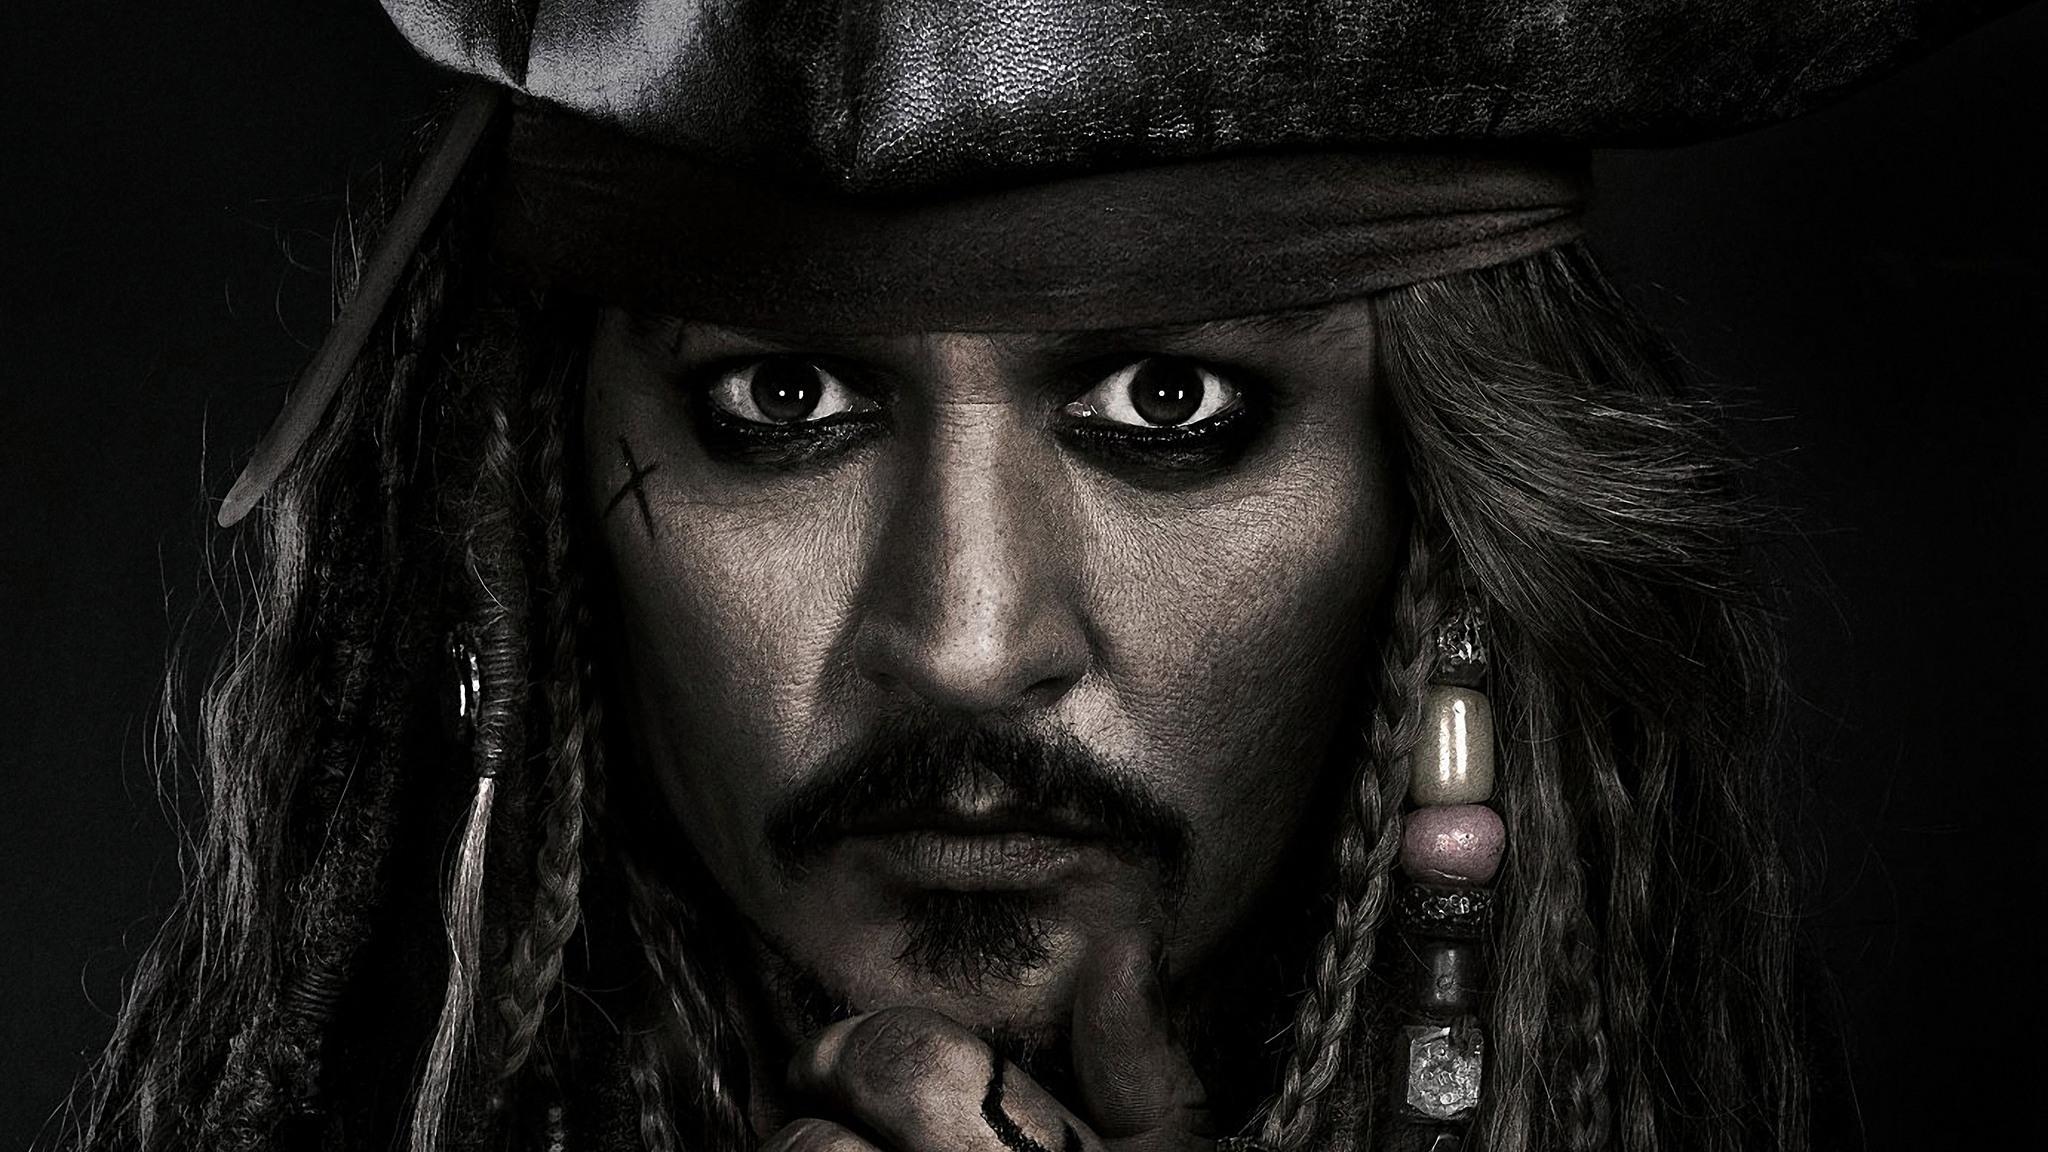 2048x1152 Captain Jack Sparrow Pirates Of The Caribbean